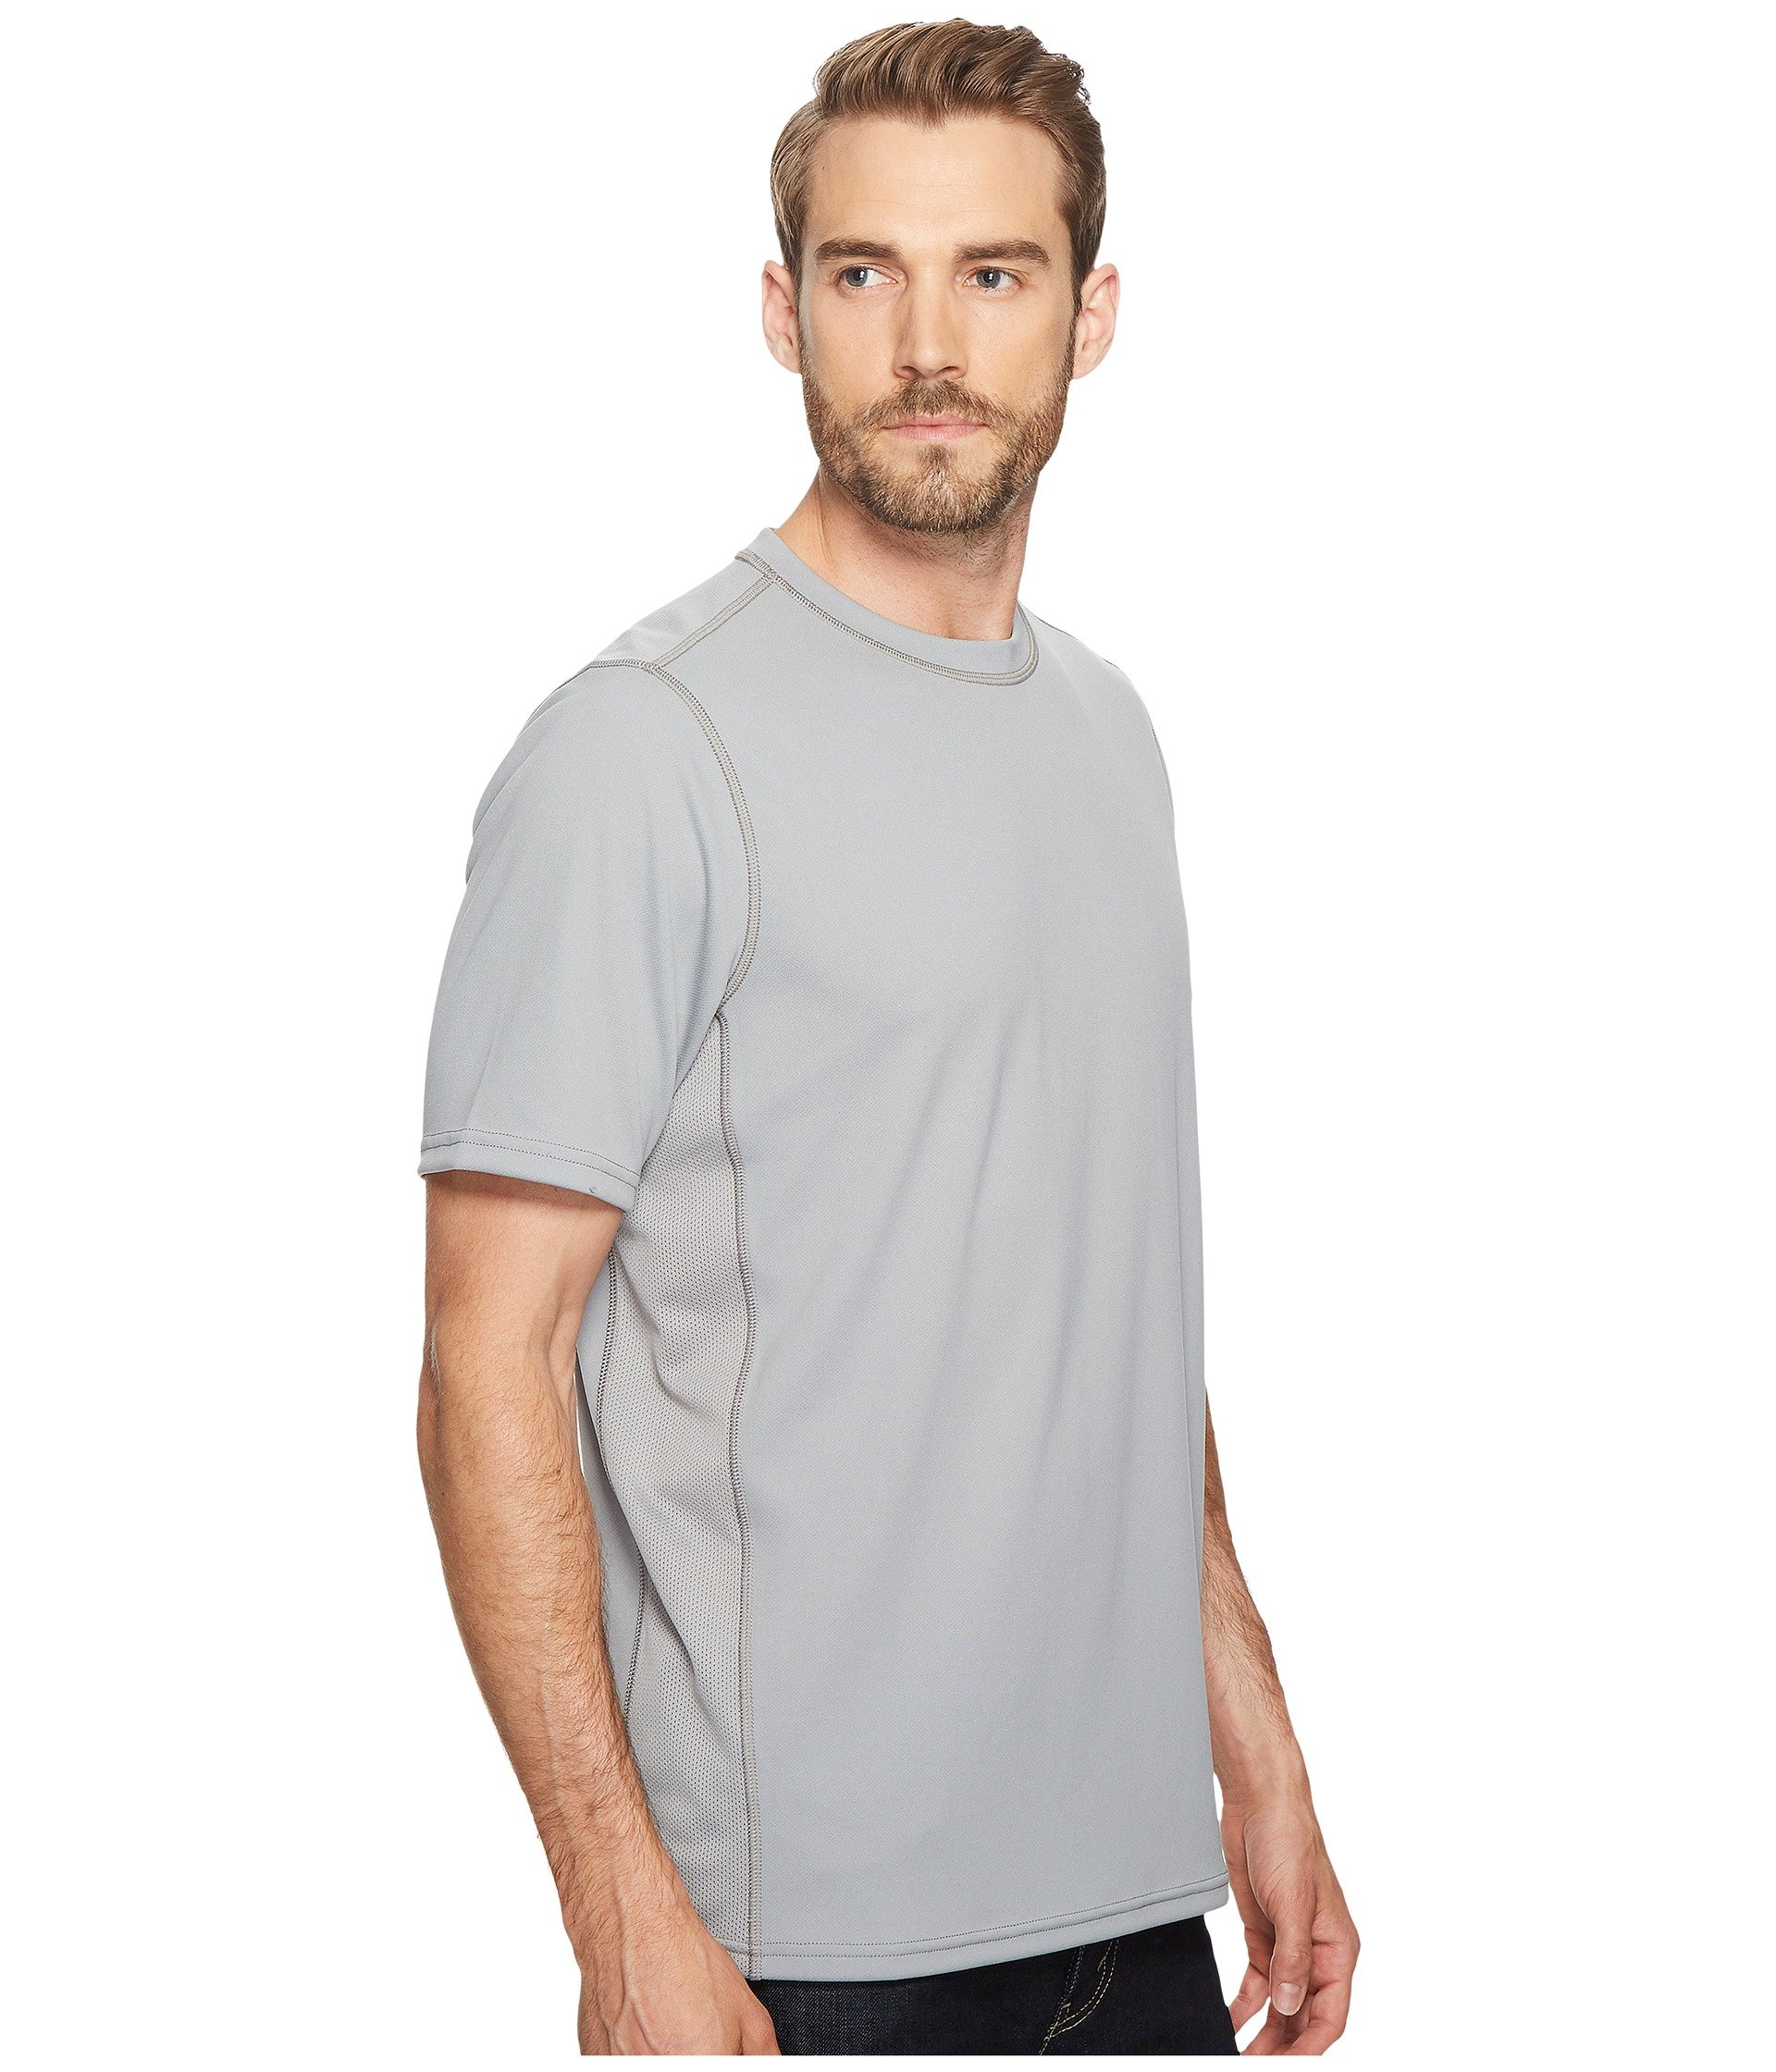 T Good Sleeve Pro Dove Wild Wicking Short shirt Timberland nf6vXSq